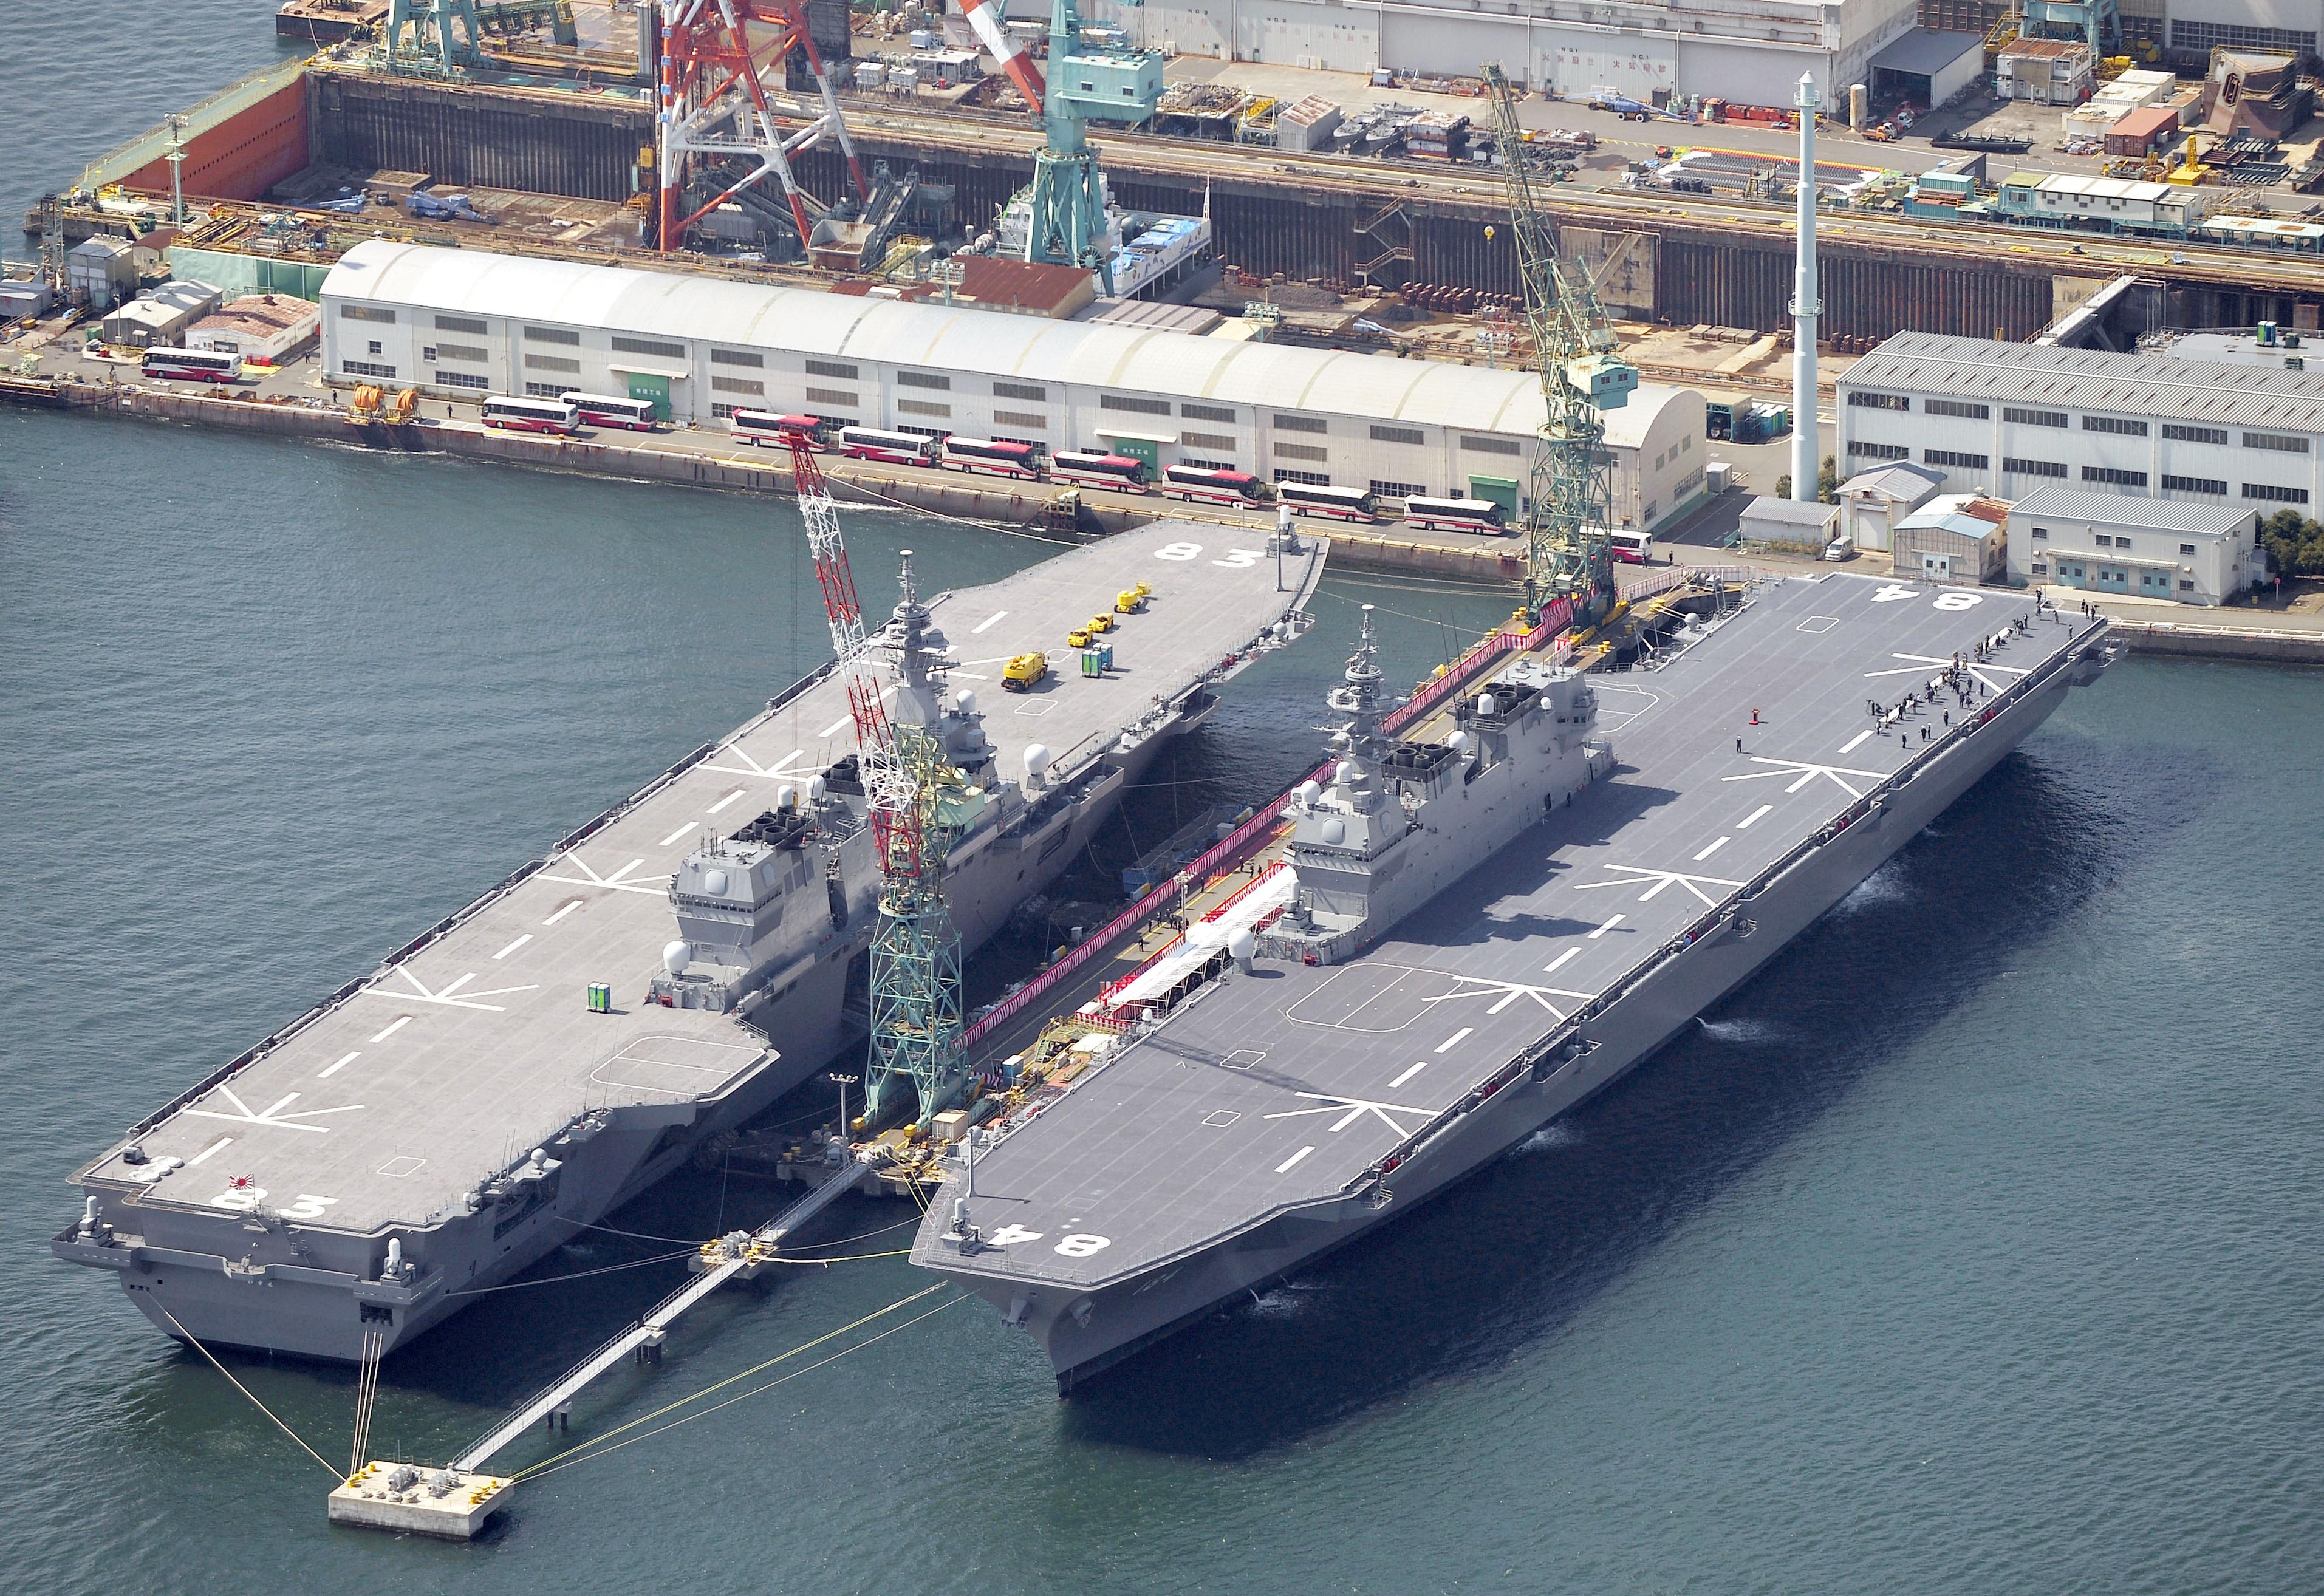 The Japan Maritime Self-Defense Force's helicopter carrier Kaga, right, and the Izumo are seen in Yokohama, south of Tokyo. (Yoshitaka Sugawara/Kyodo News via AP)